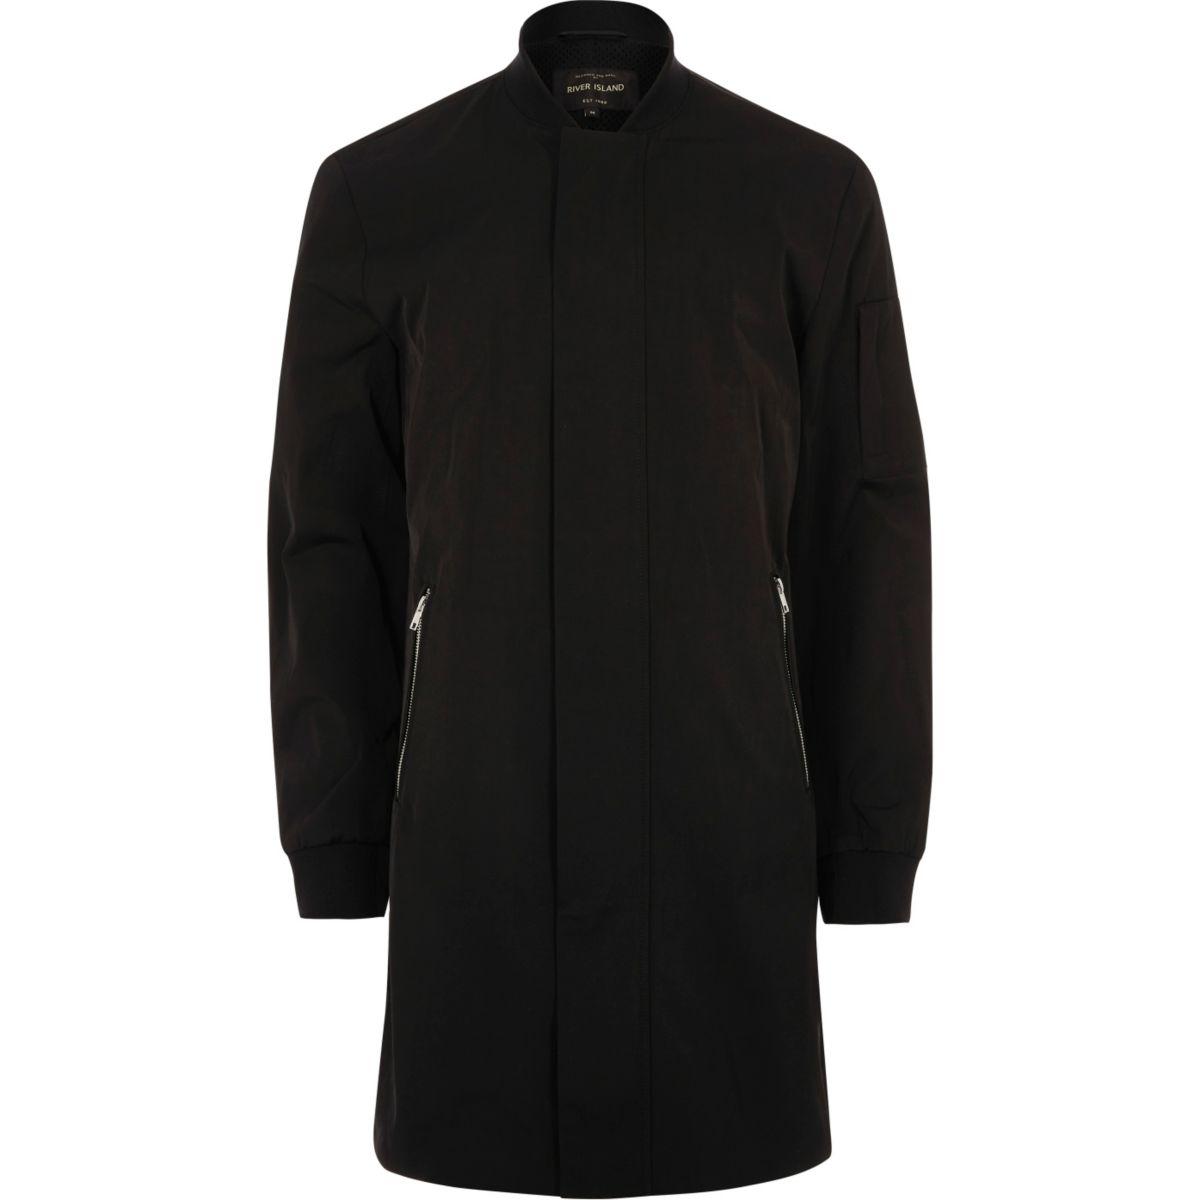 Black longline zip up jacket